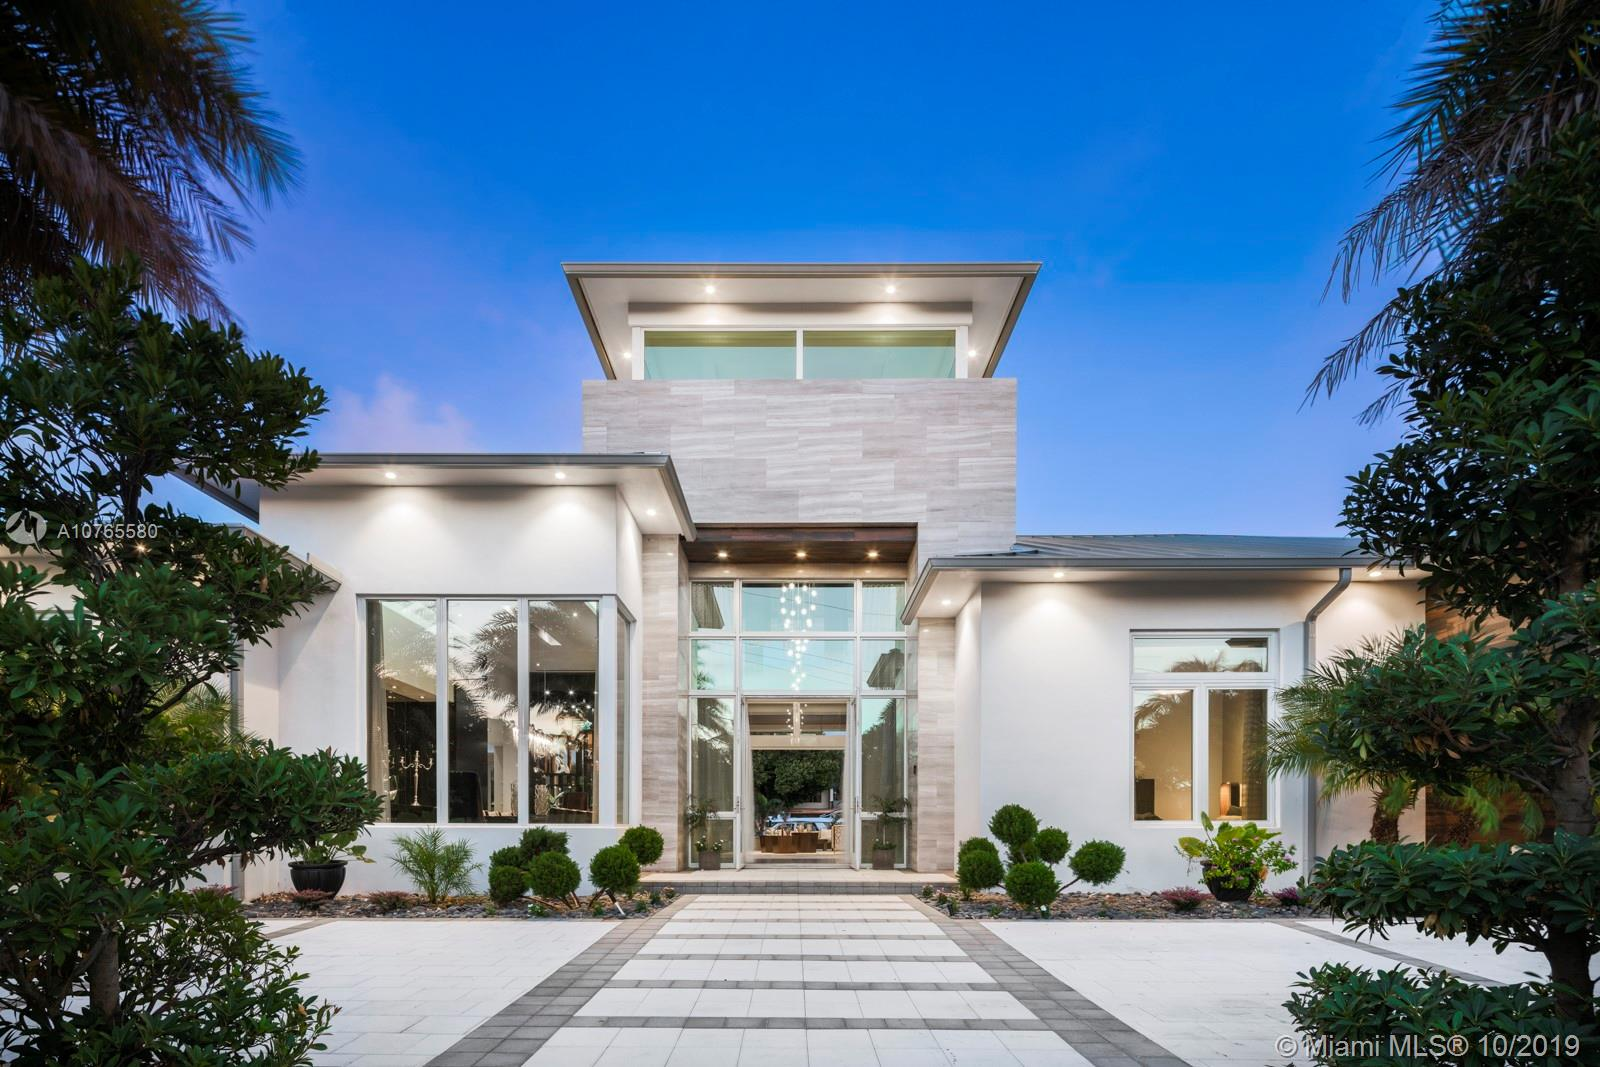 image #1 of property, Lauderdale Isles Reamen P